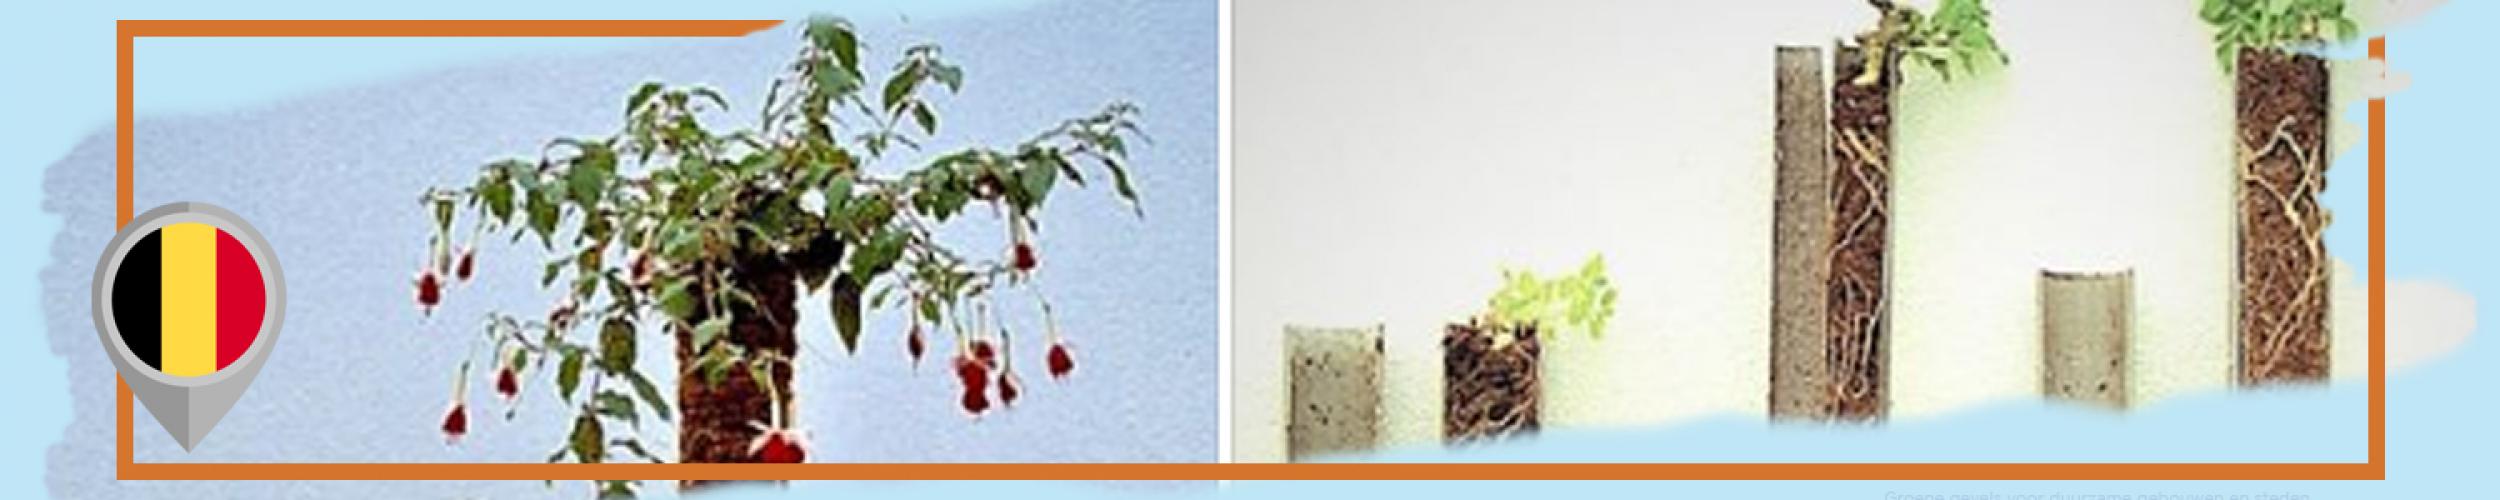 An interesting experiment on tree saplings by Prof. Dr. Willem Van Cotthem (Ghent University, Belgium)